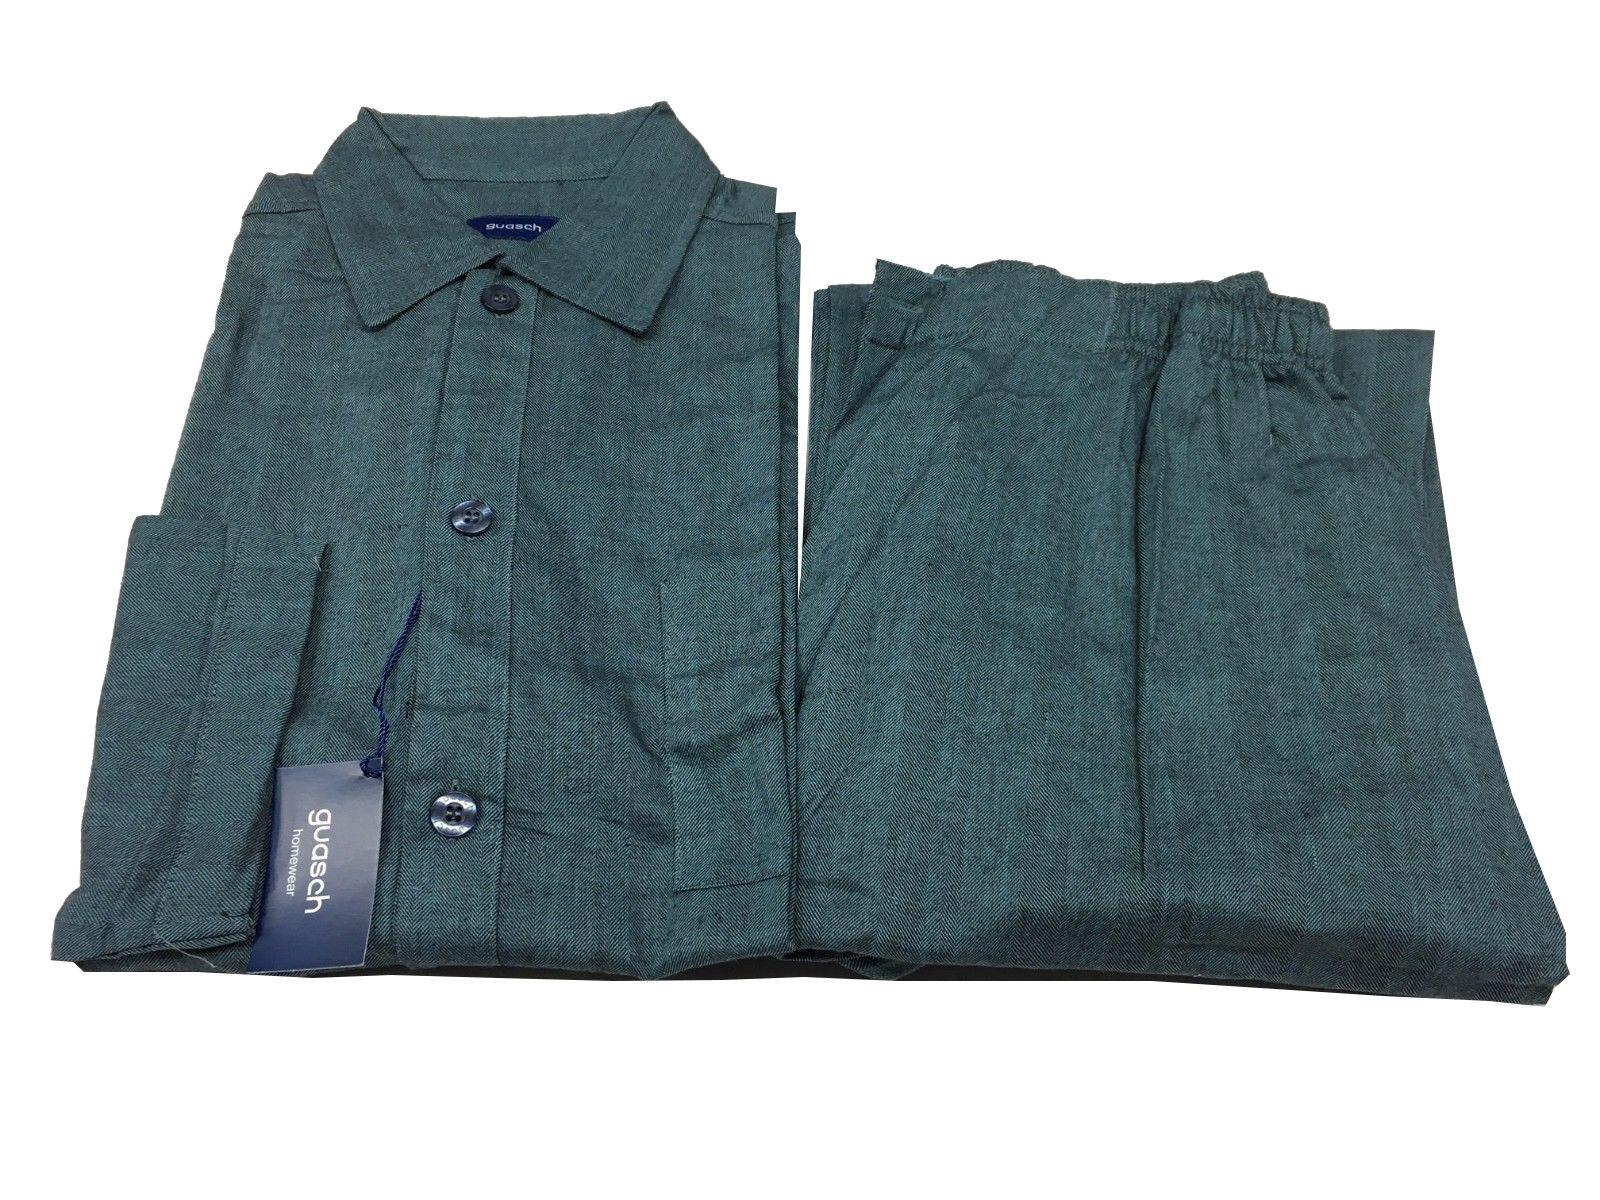 Guasch Man Pajamas Flannel Oil Herringbone 100% Cotton